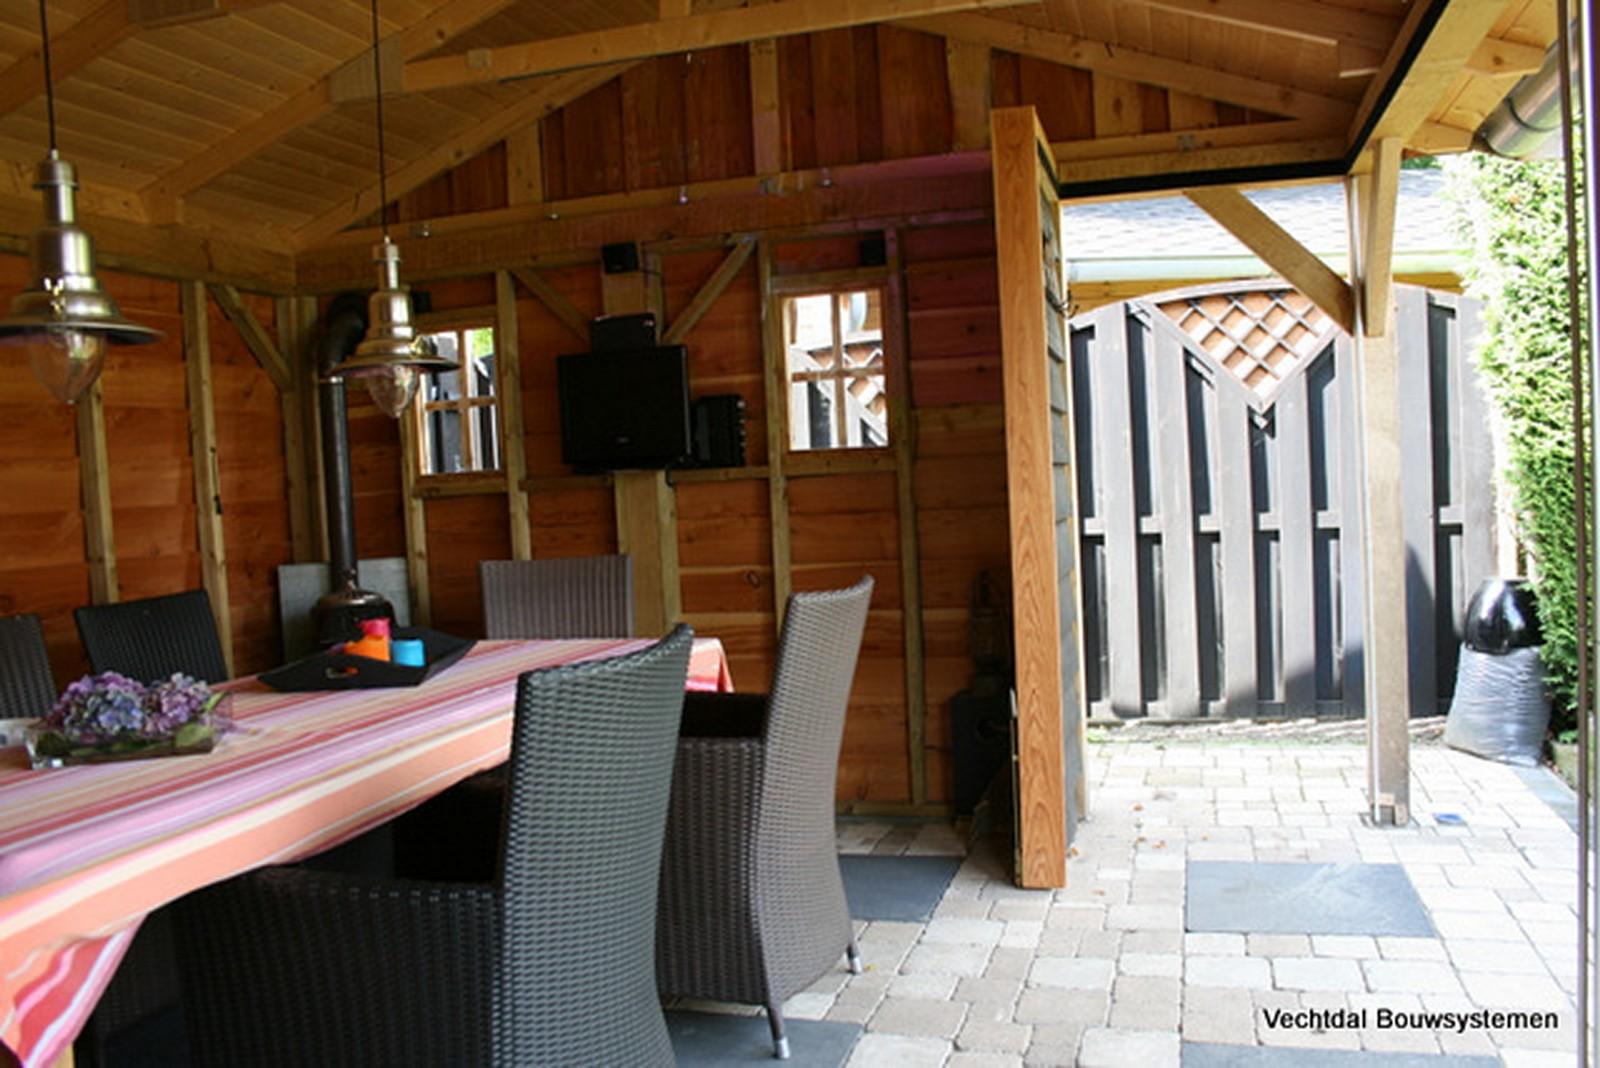 lariks_buitenkamers - Authentiek eikenhouten tuinhuis met tuinkamer.